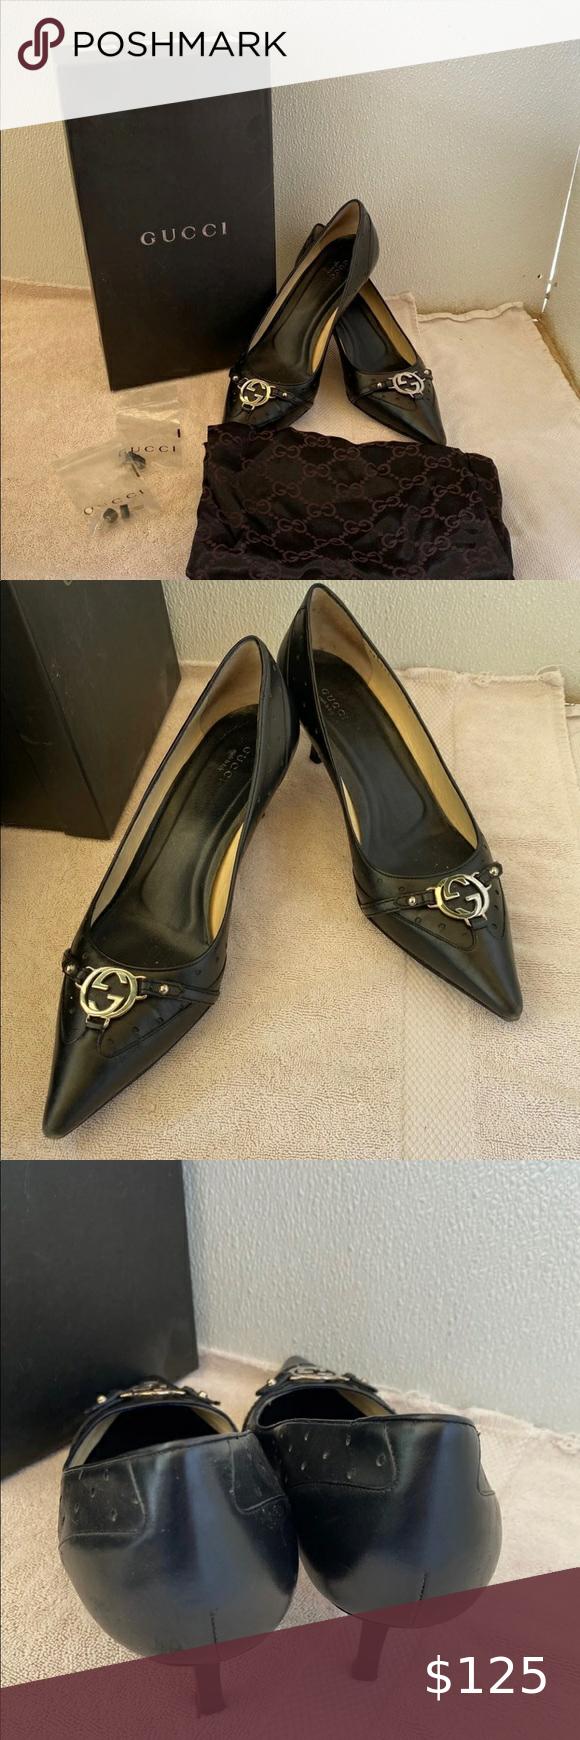 Gucci Authentic Ladies Black Kitten Heel Pumps 10 In 2020 Black Kitten Heels Kitten Heel Pumps Black Leather Pumps